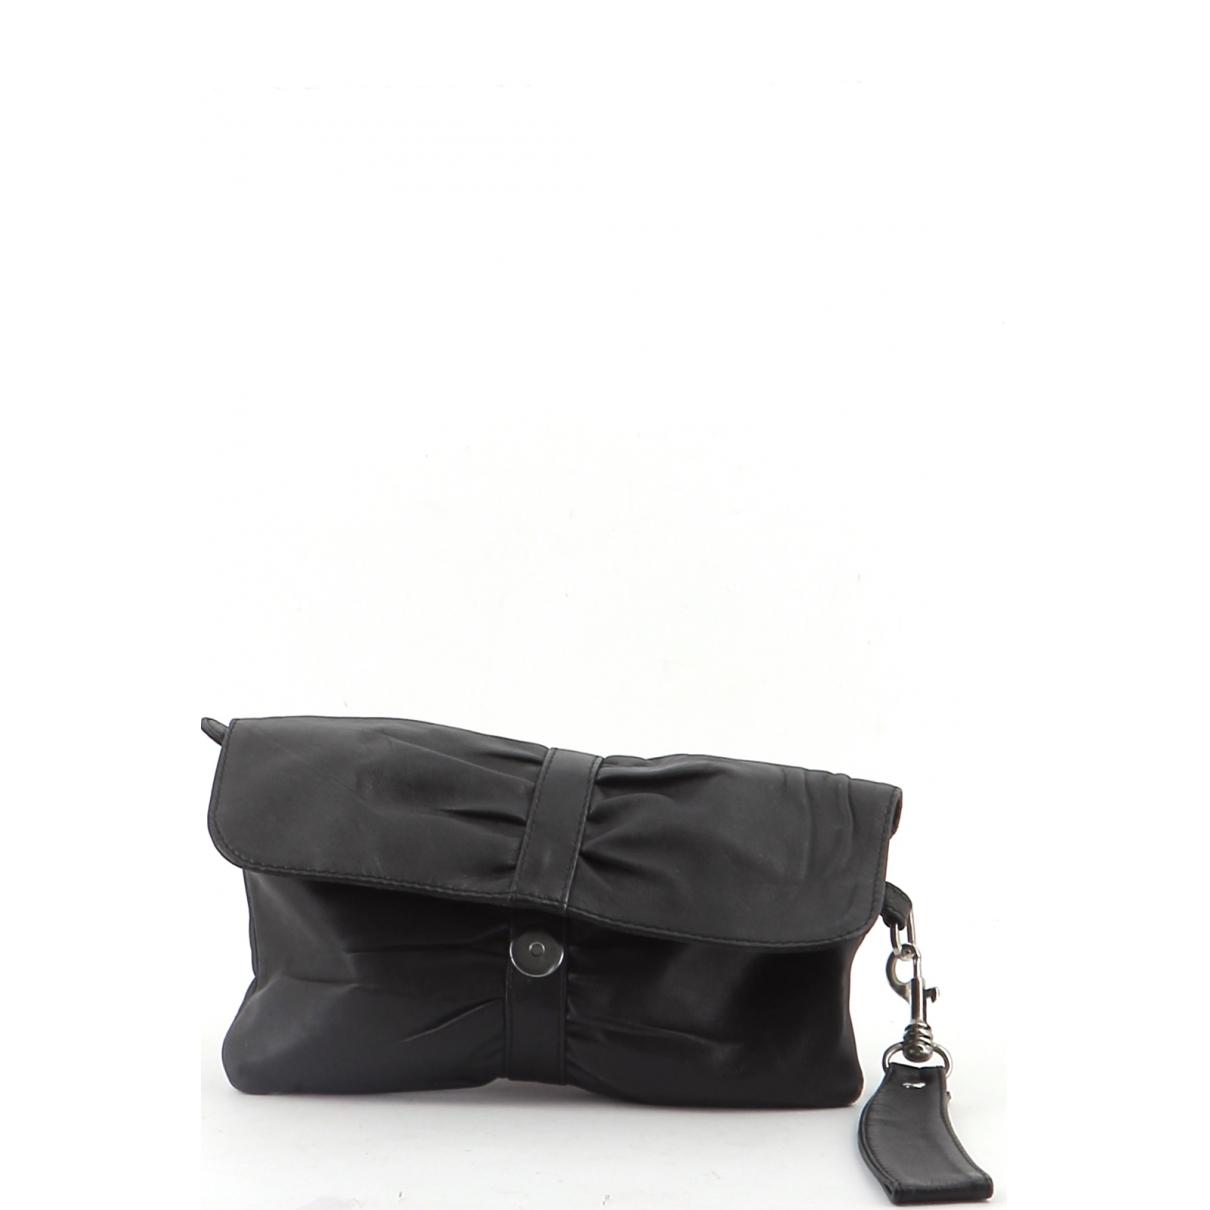 Petite Mendigote \N Black Leather Clutch bag for Women \N